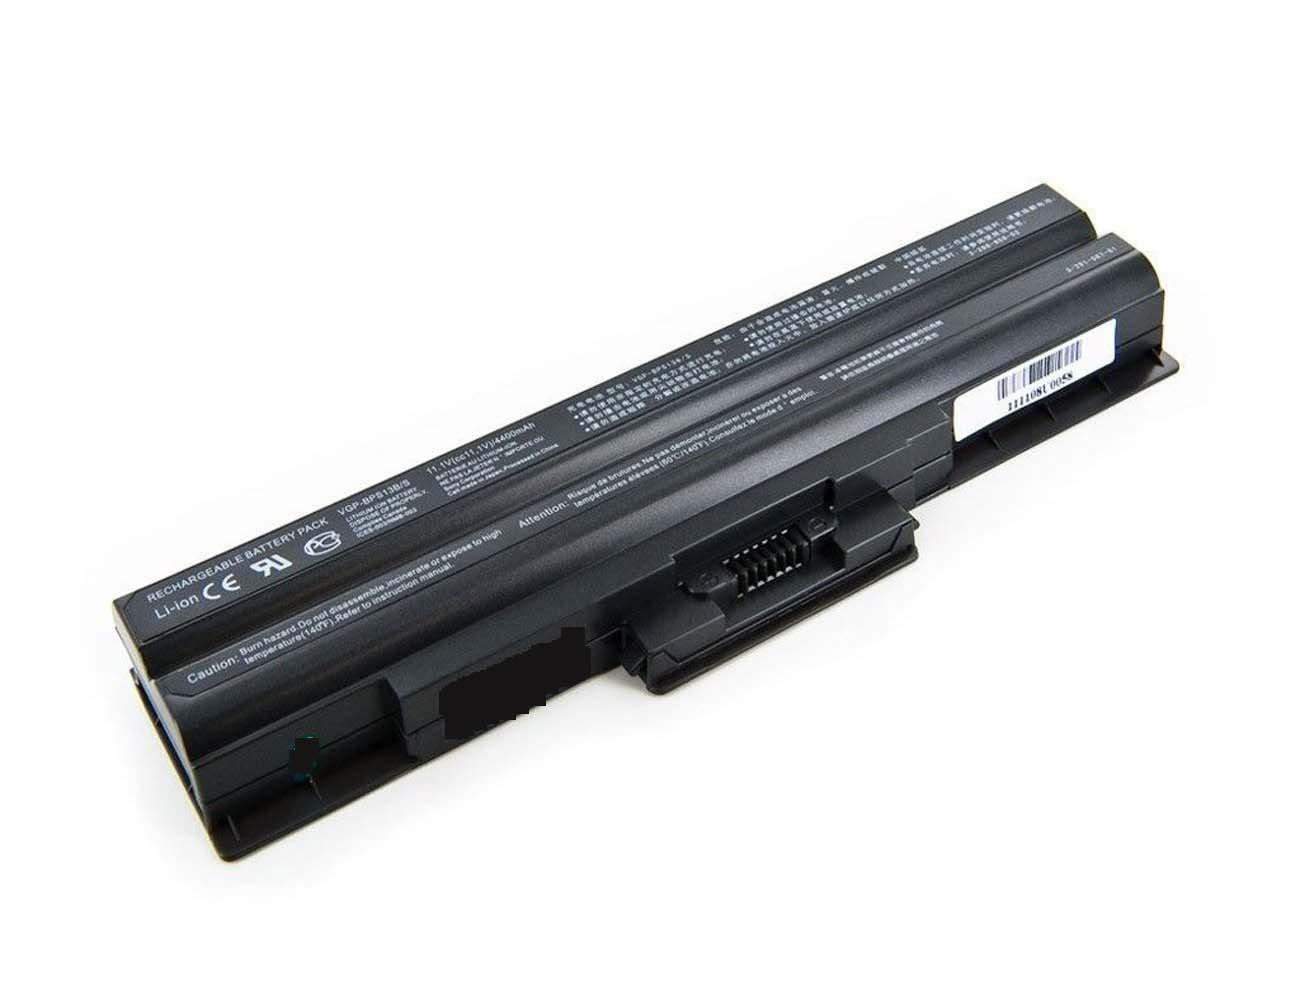 Bateria Para Sony Vaio Pcg-81115l Pcg-81214l Pcg-81312l Pcg-8131l Pcg-5n2l Pcg-5n4l Pcg-5p2l Pcg-5p4l Pcg-5r1l Pcg-51411